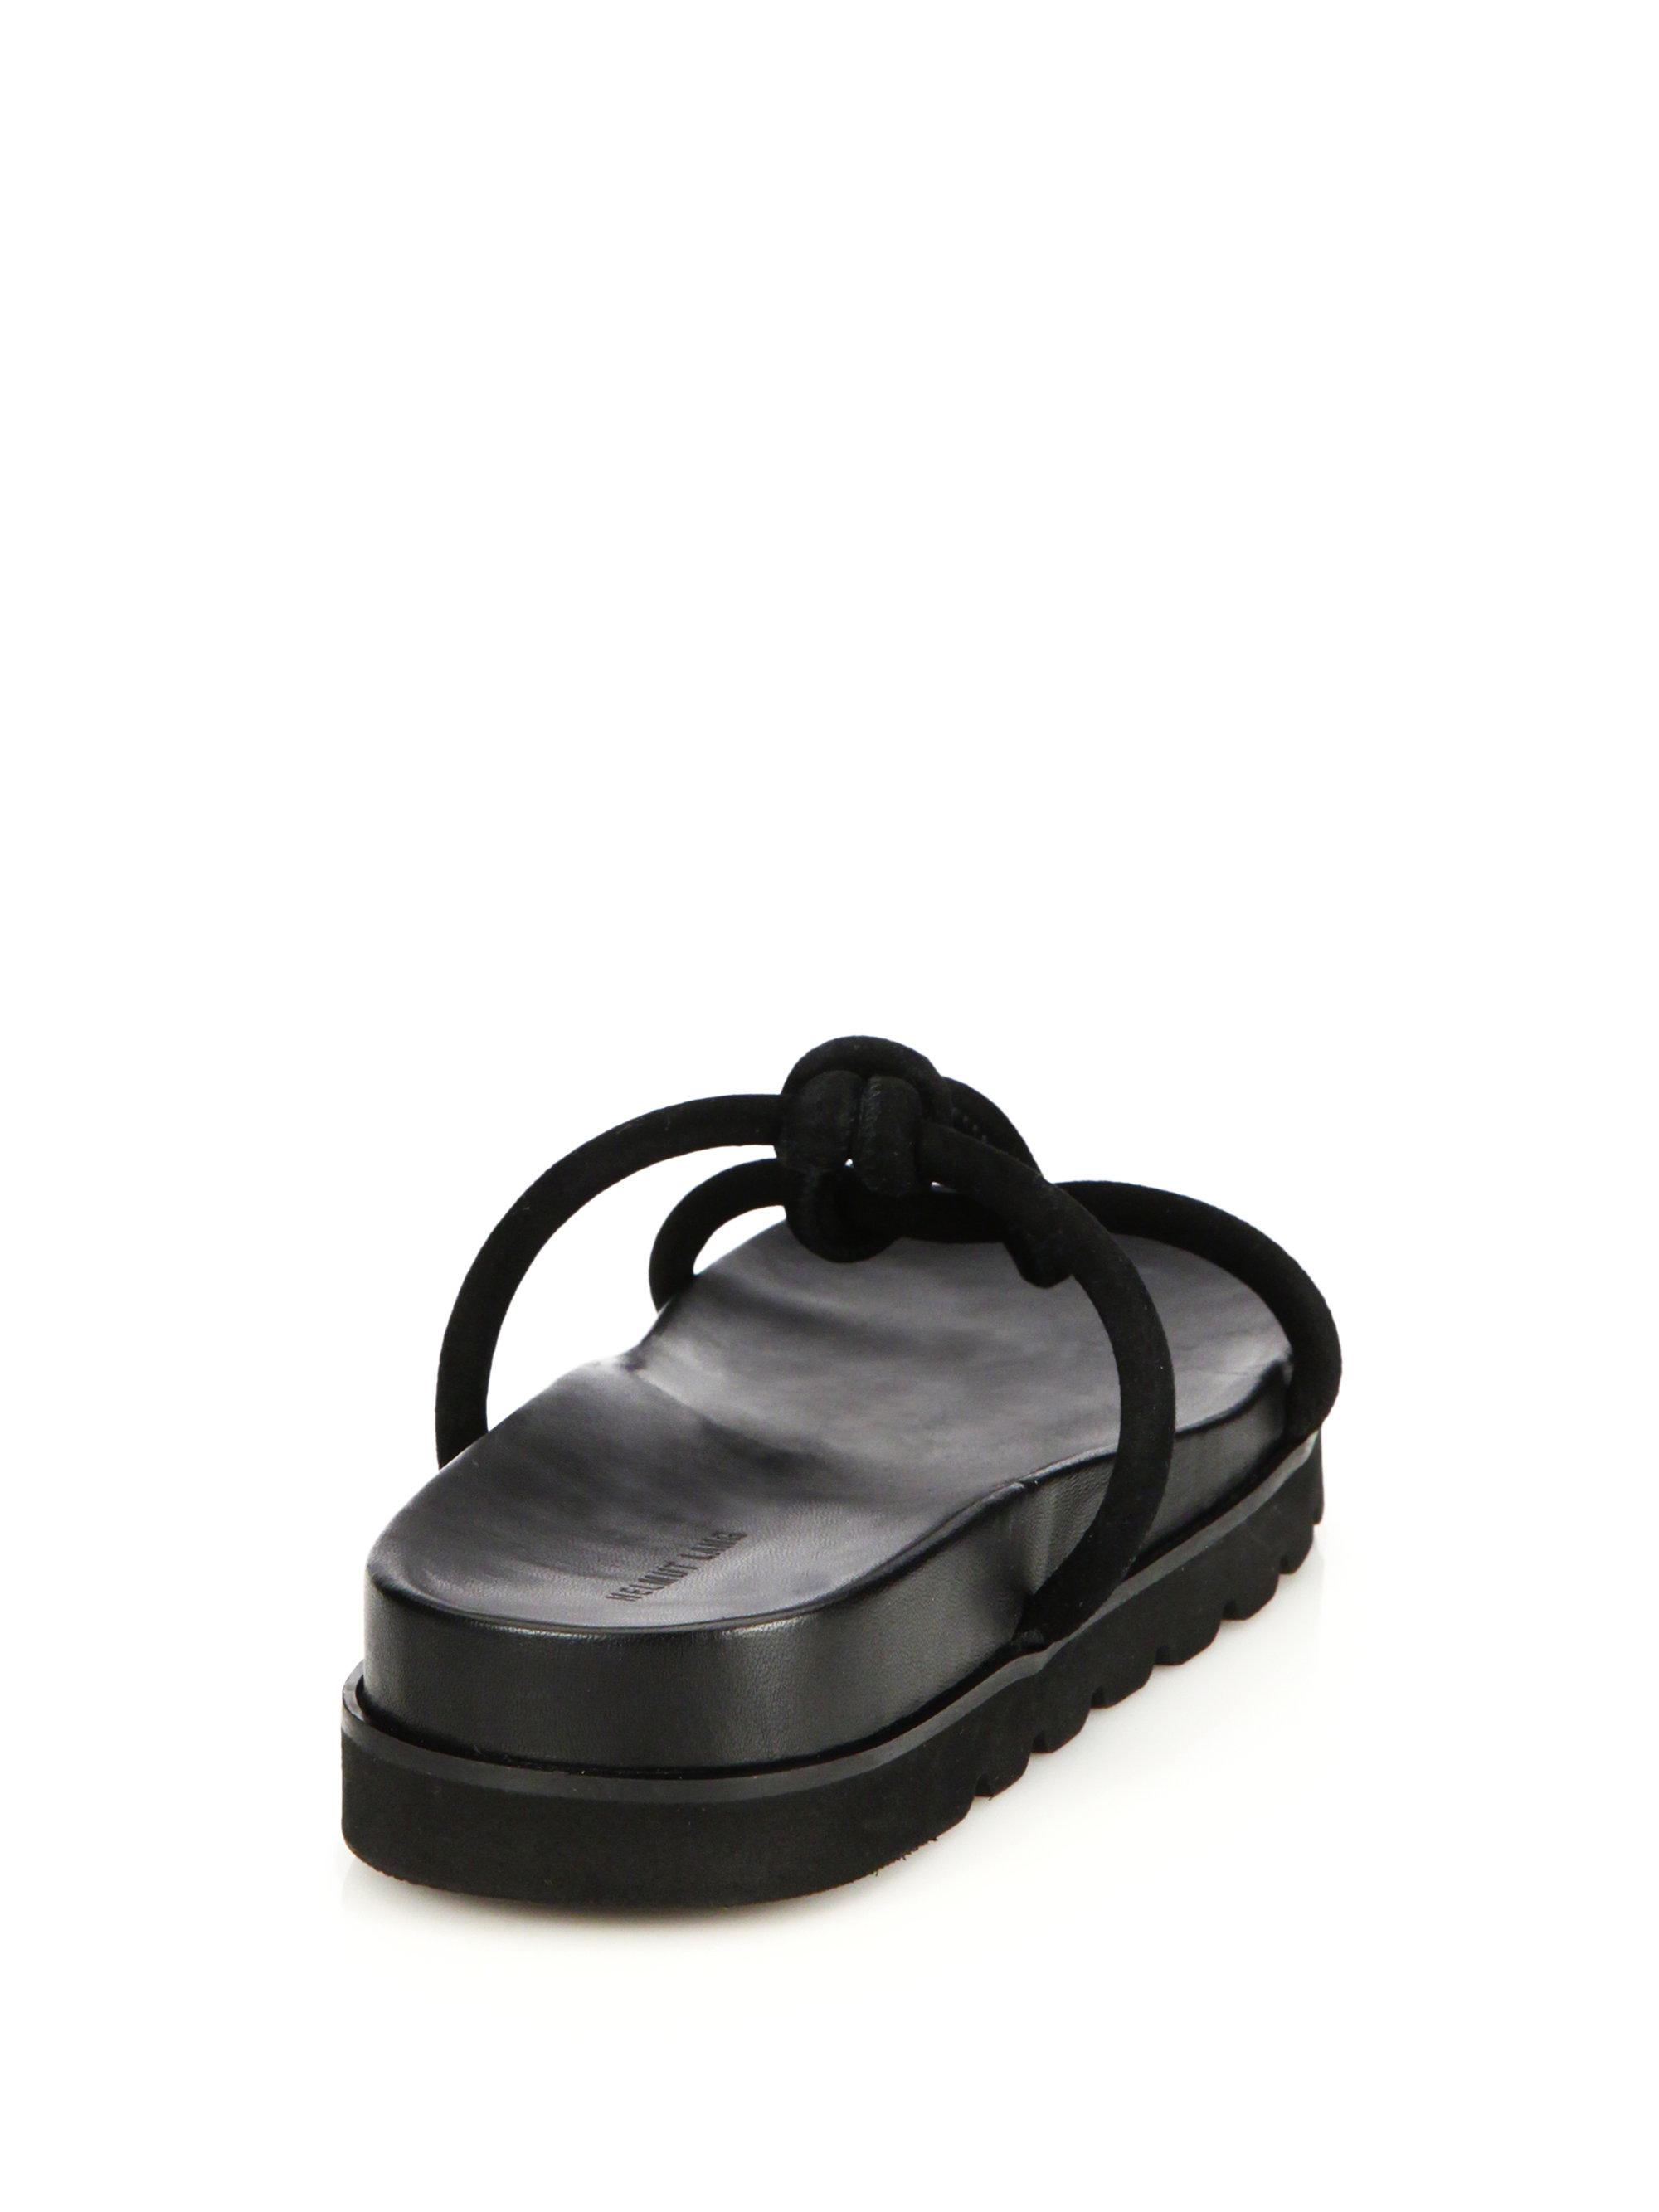 sale exclusive Helmut Lang Leather Slide Sandals buy cheap amazon tSx781